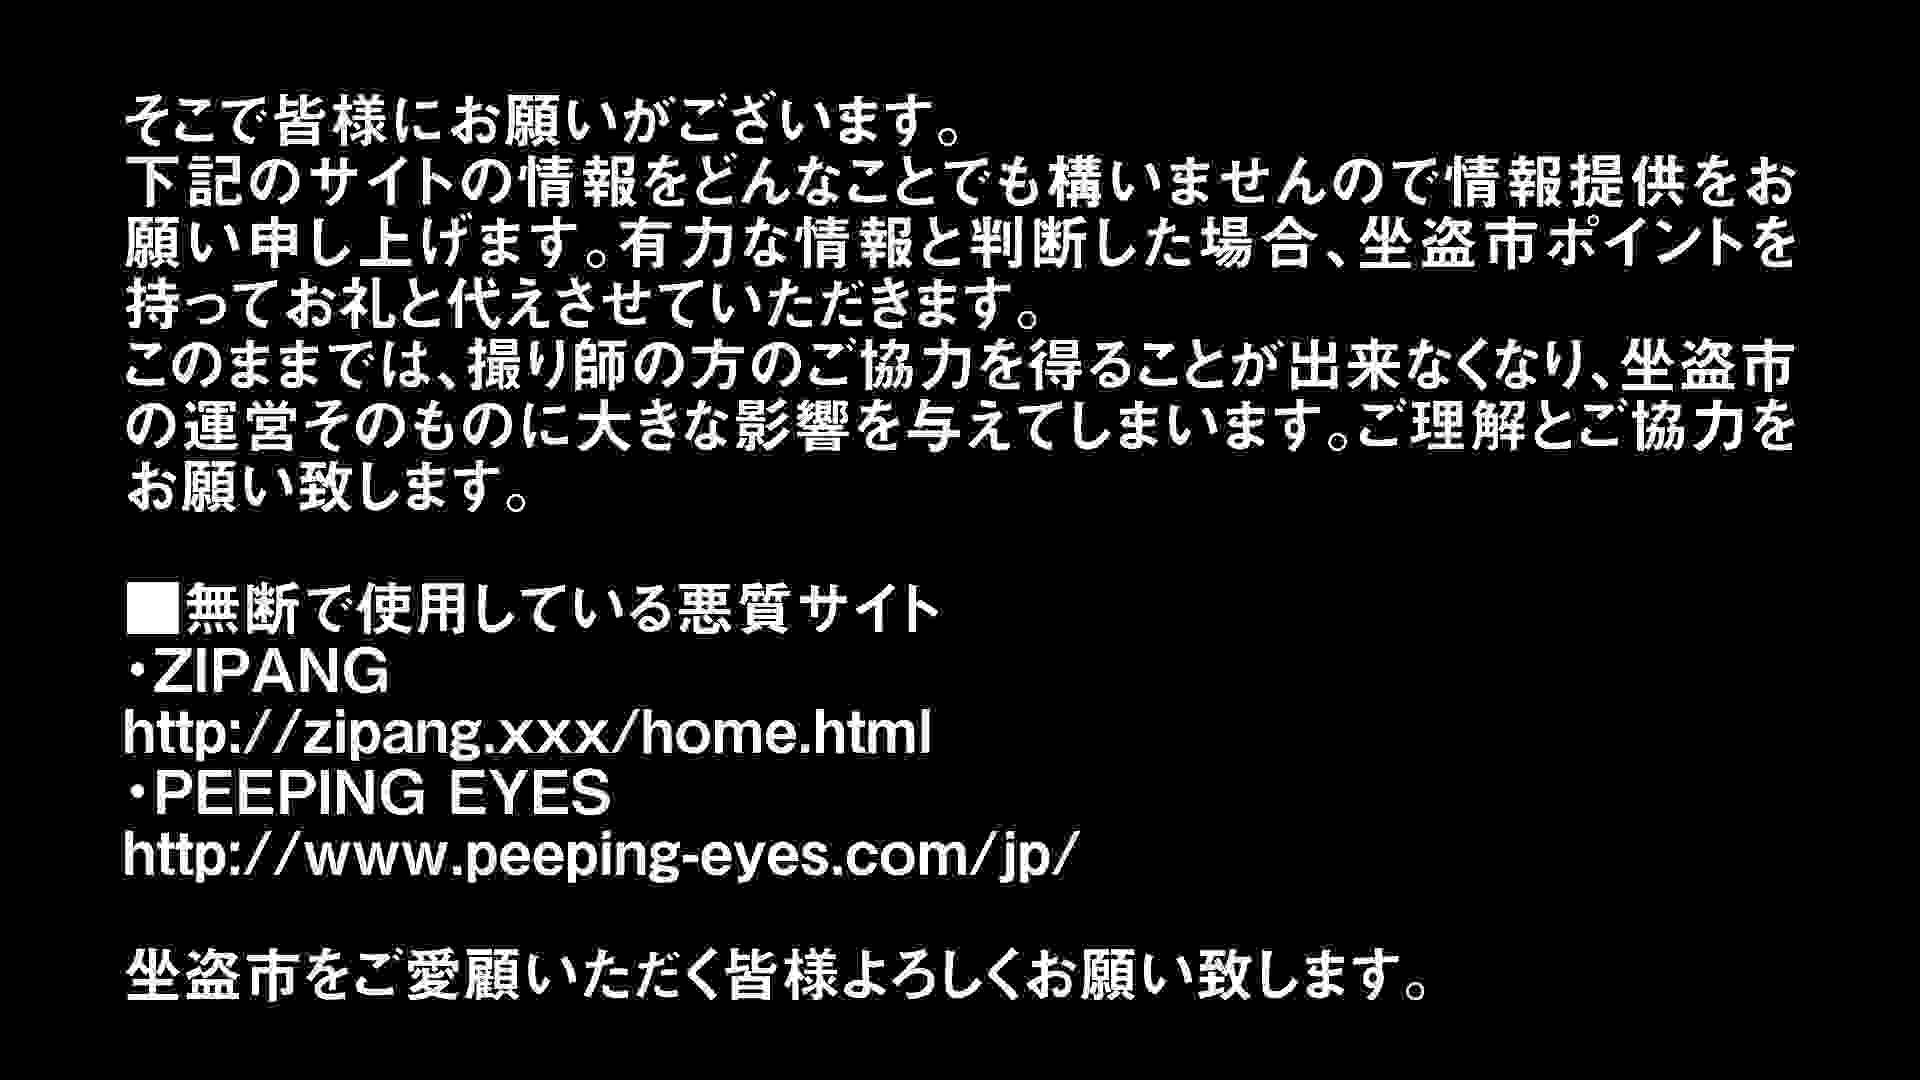 Aquaな露天風呂Vol.296 盗撮シリーズ   露天風呂編  102PIX 33